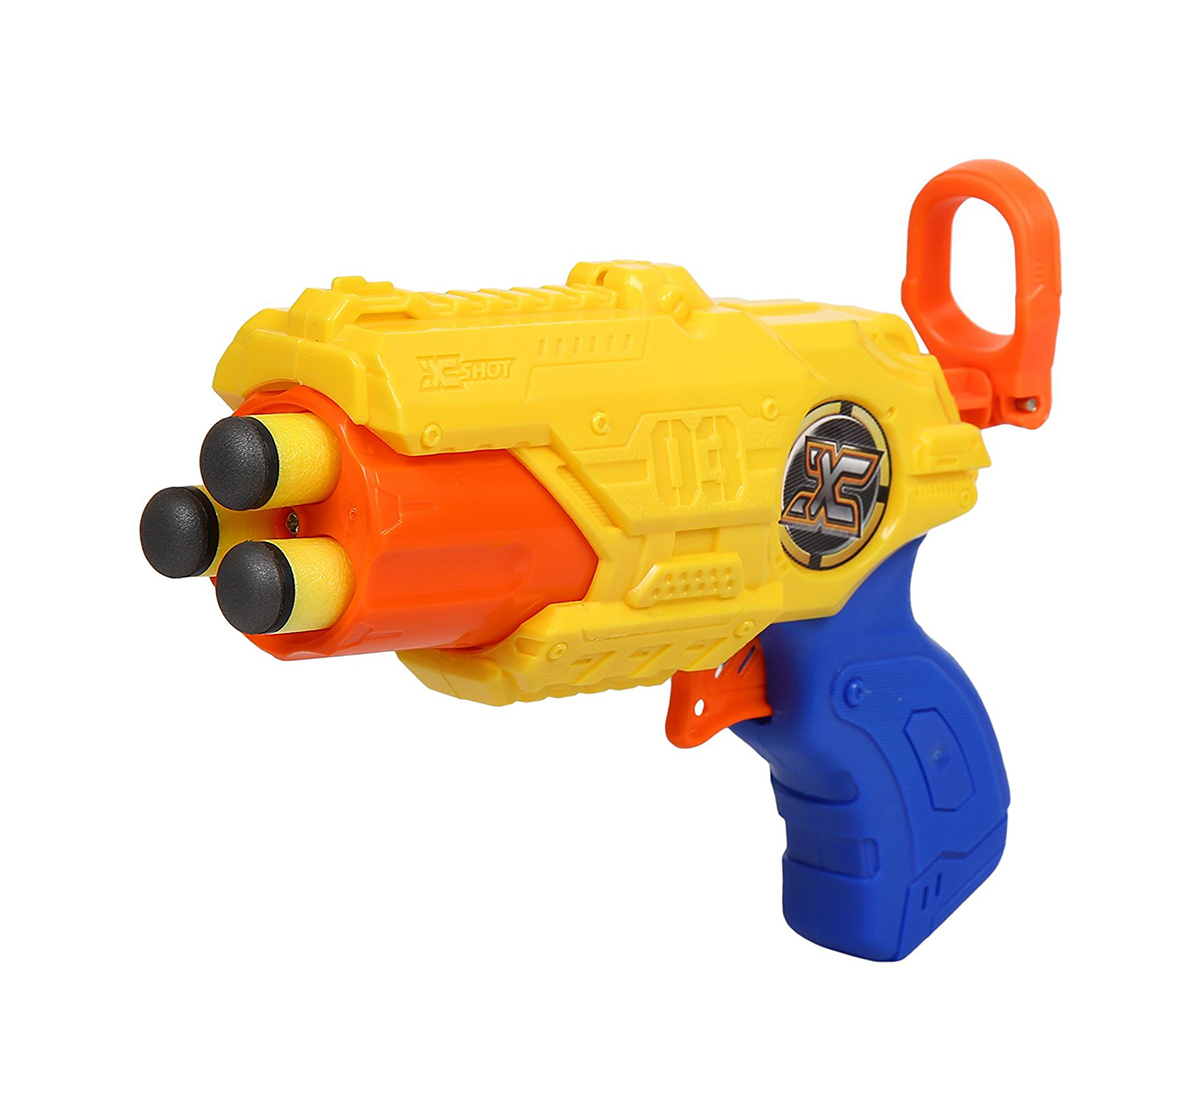 X-Shot | X-Shot Barrel Breaker Blaster Gun Tk-3 With 6 Darts, White Blasters for Kids age 8Y+ (Yellow)